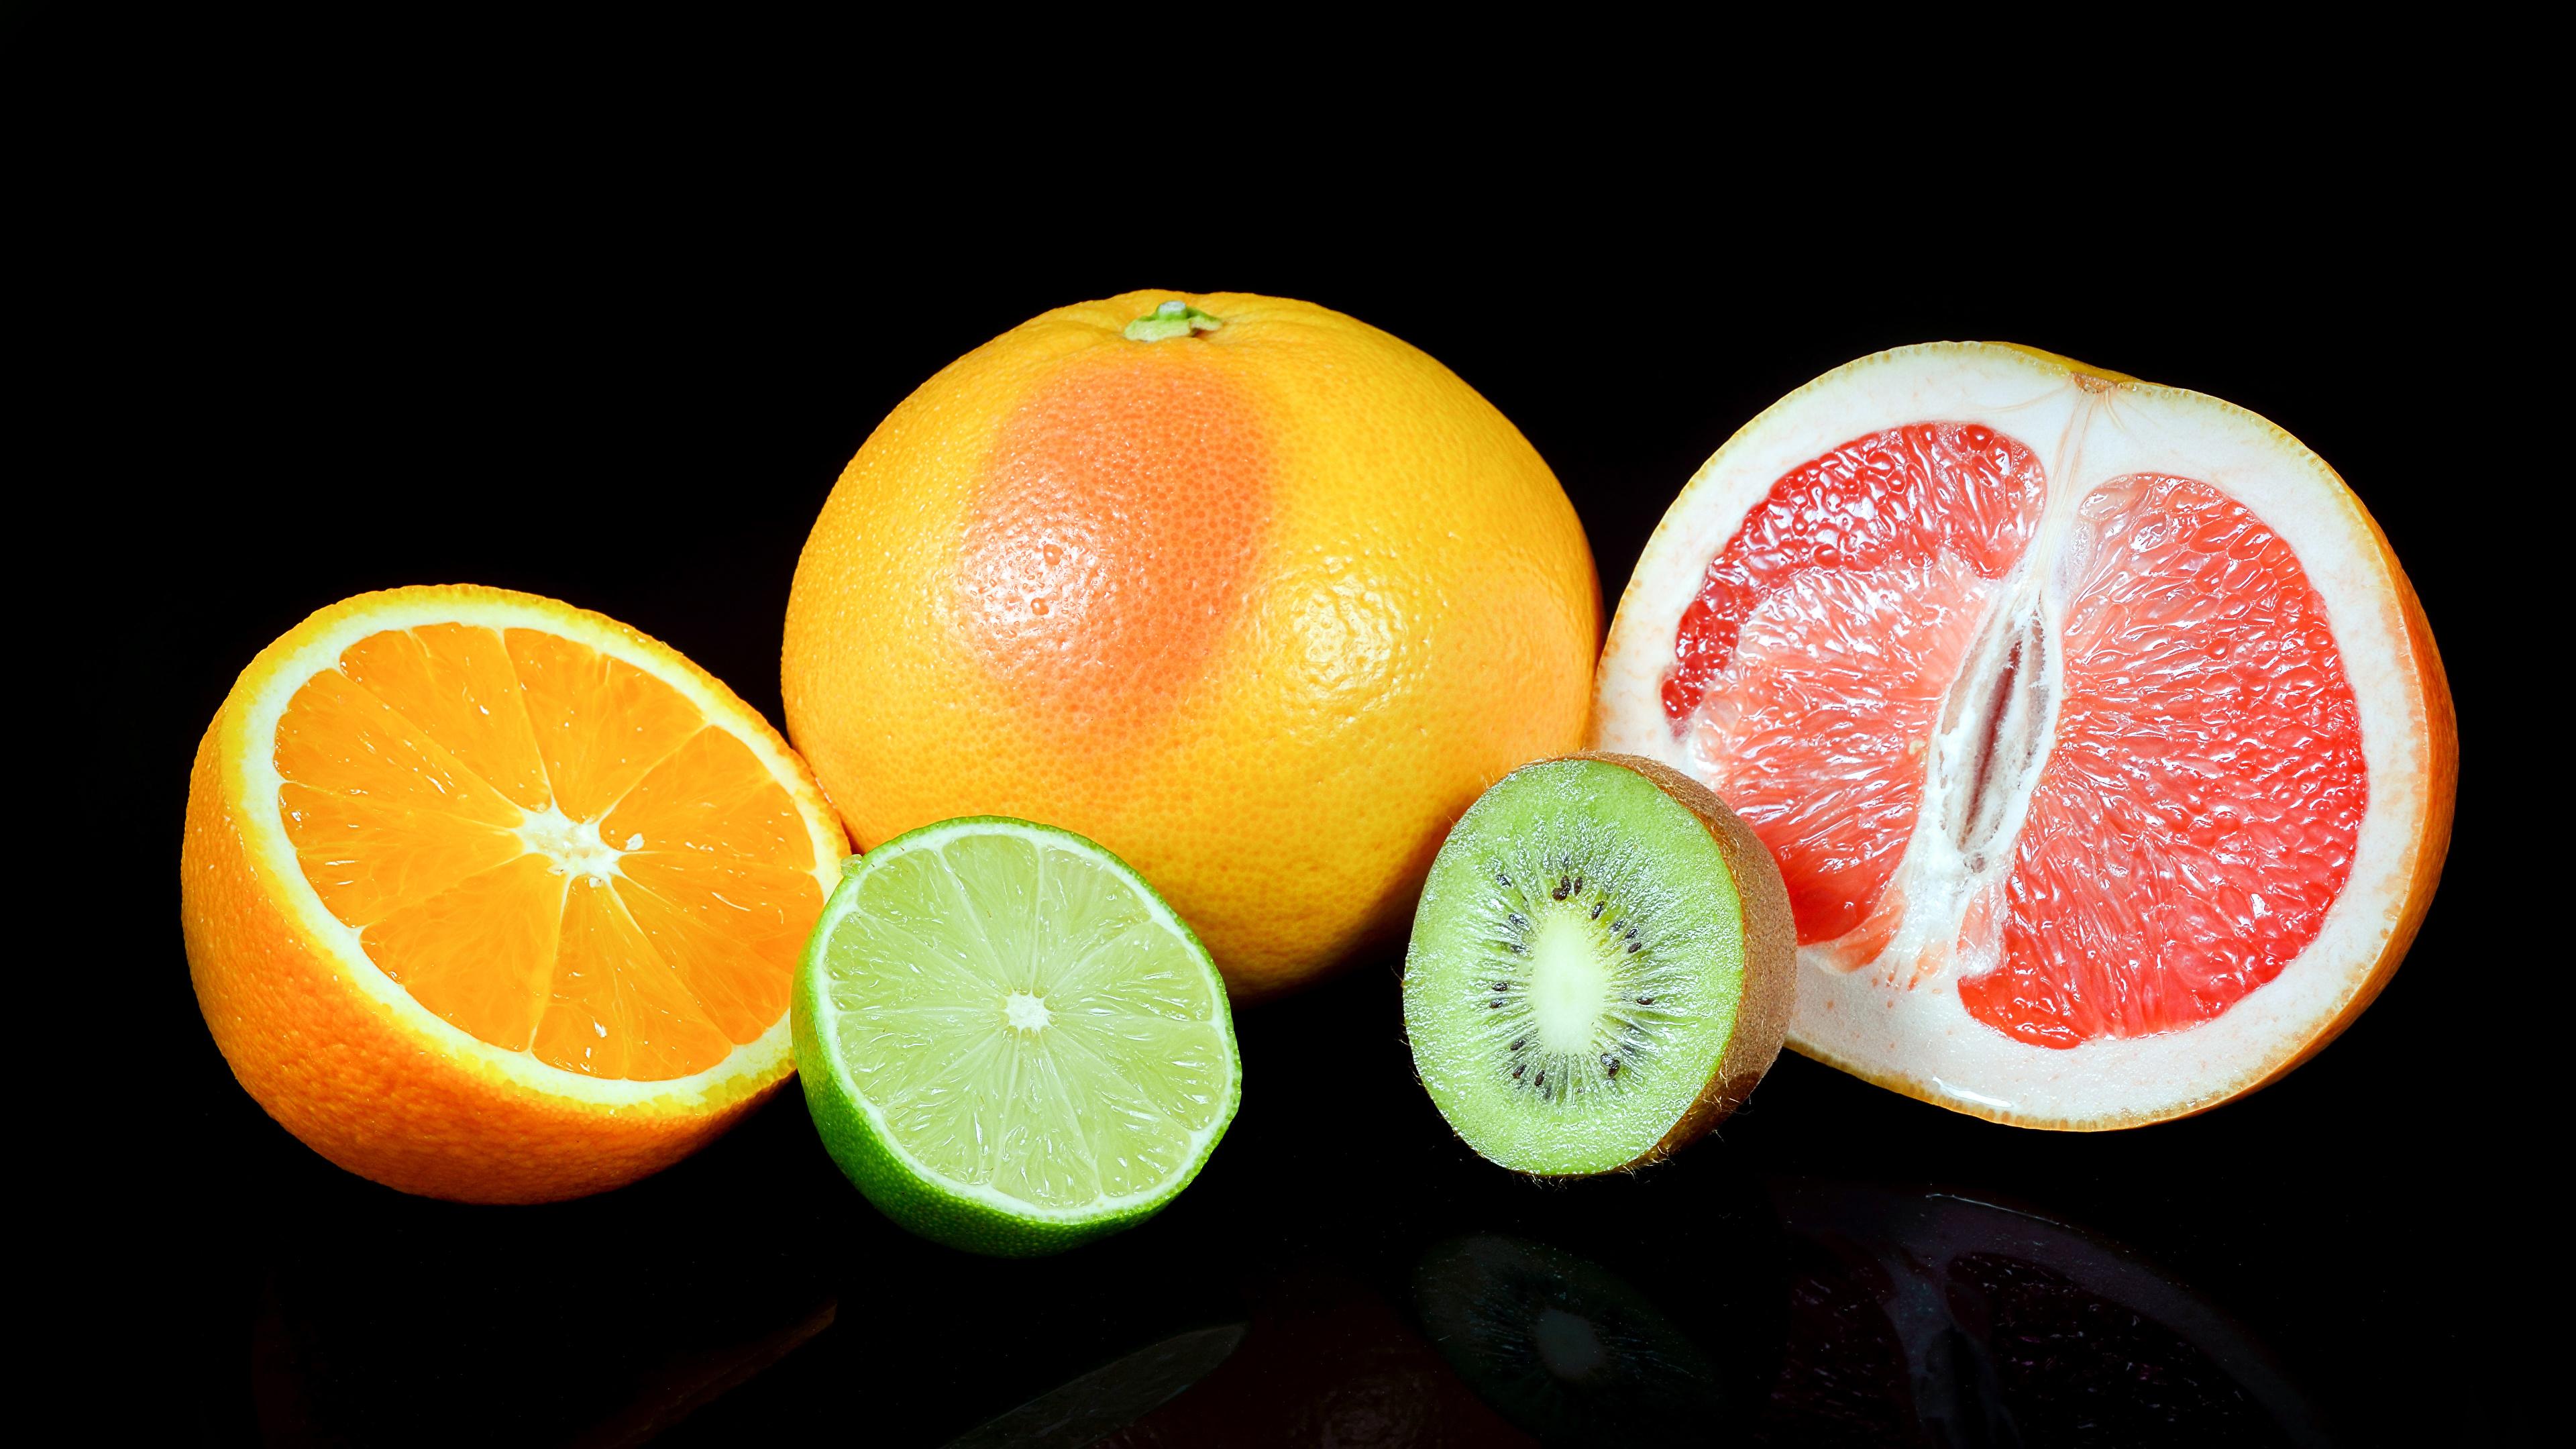 еда апельсин грейпфрут вишня лайм food orange grapefruit cherry lime на телефон